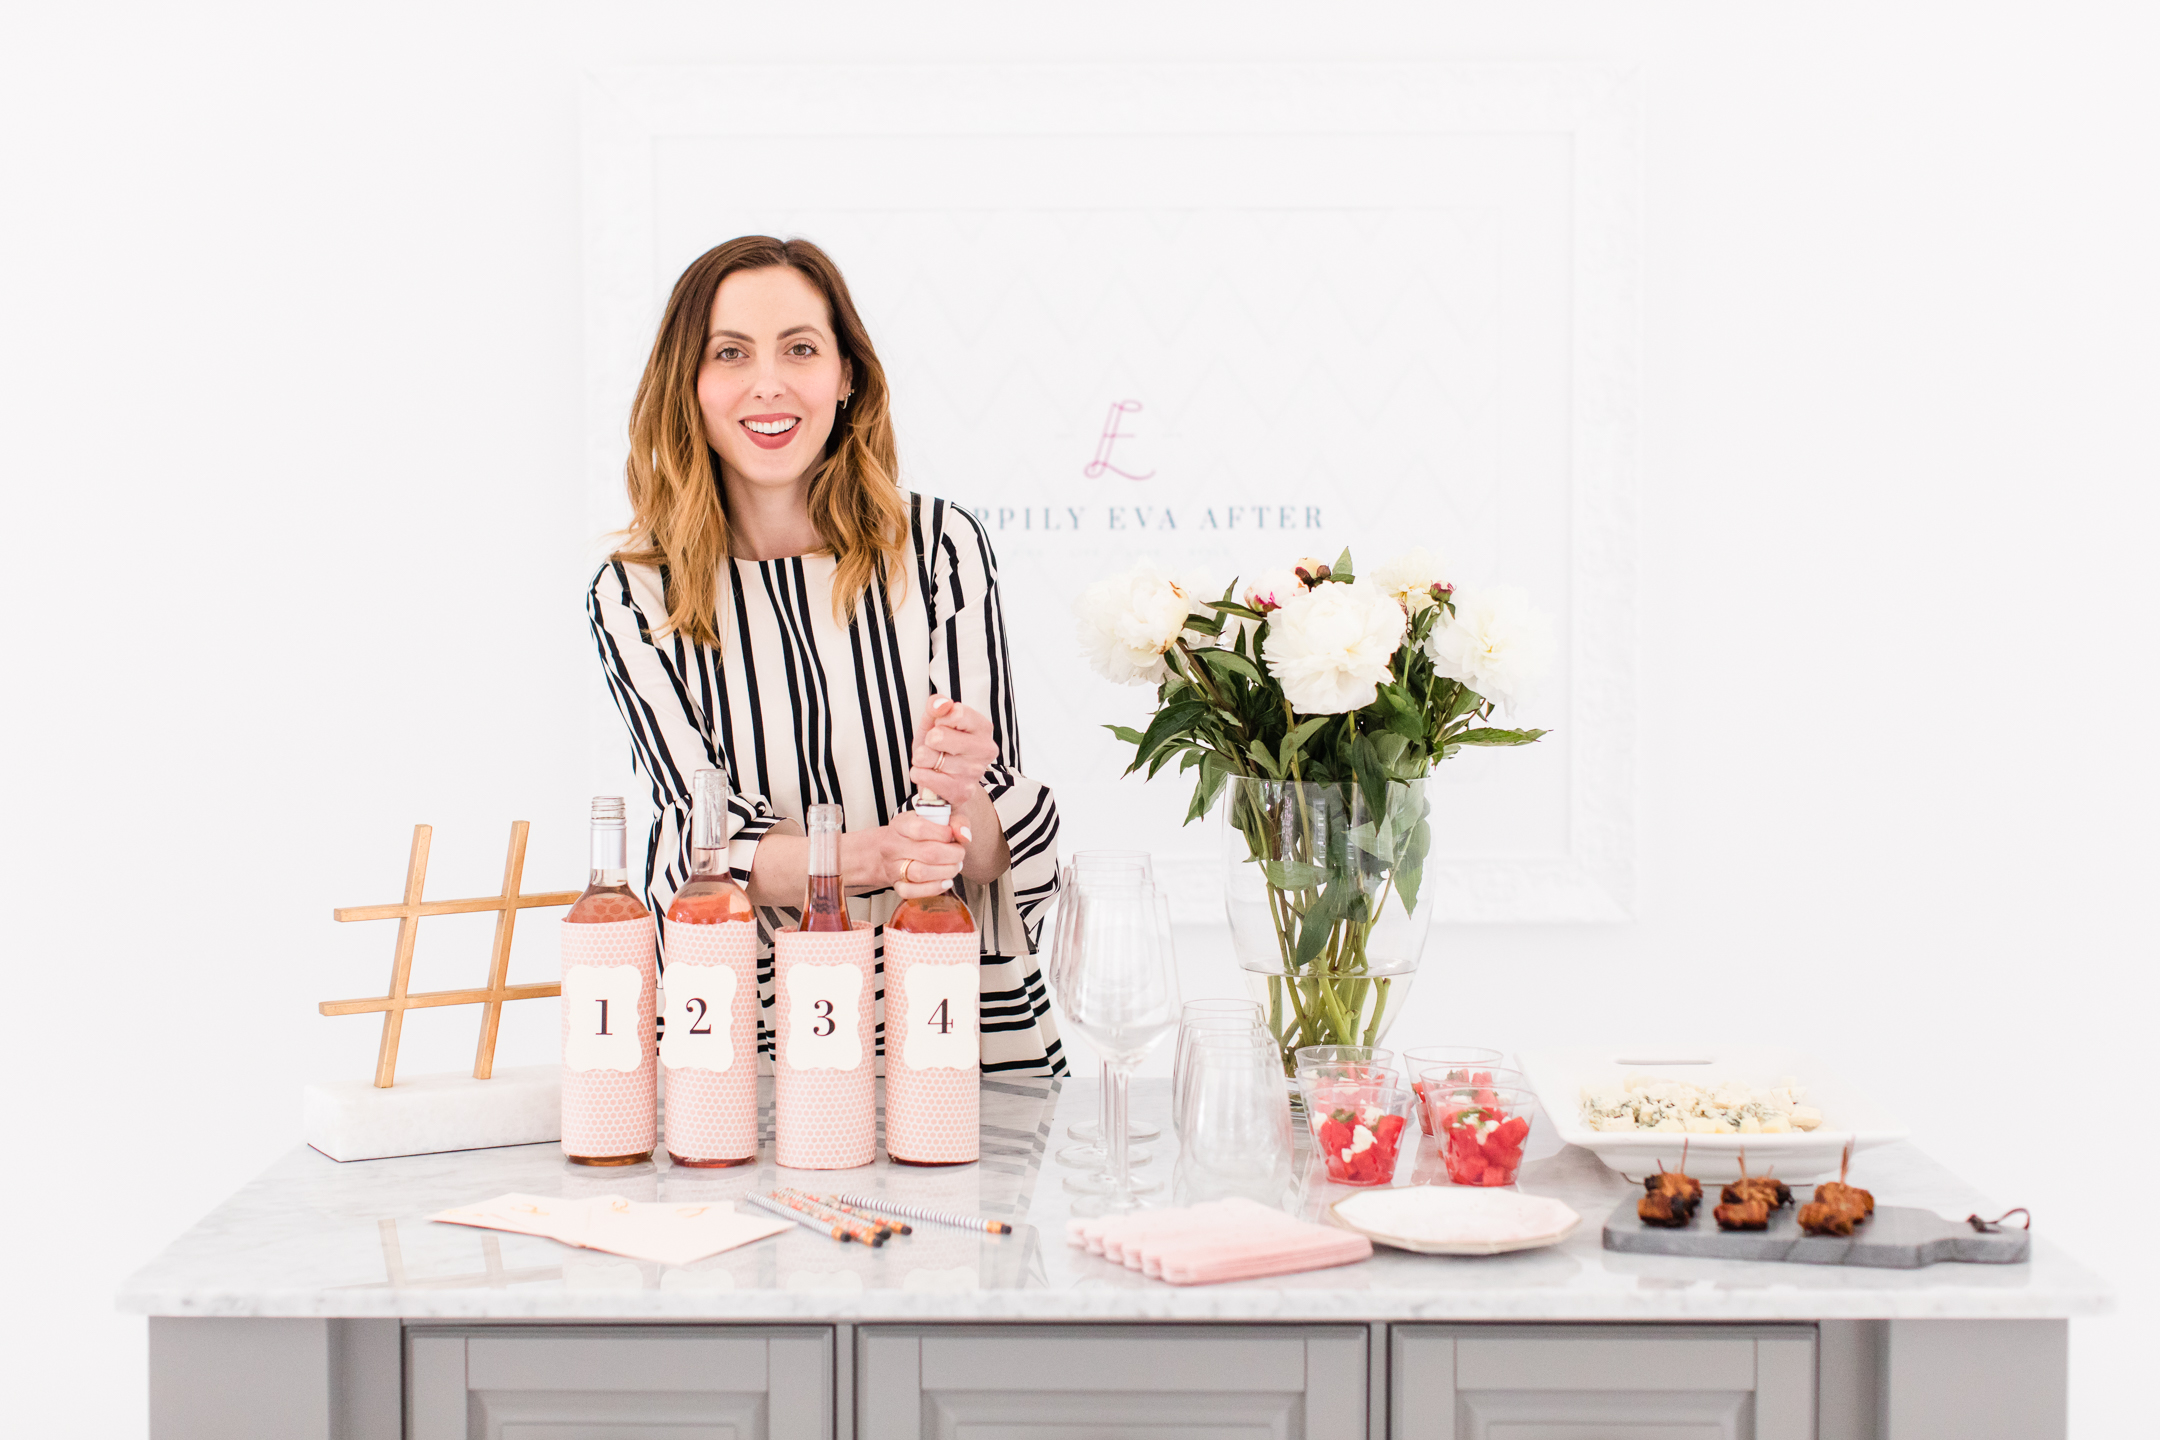 Eva Amurri hosts a Rosé Tasting Party at her Connecticut home